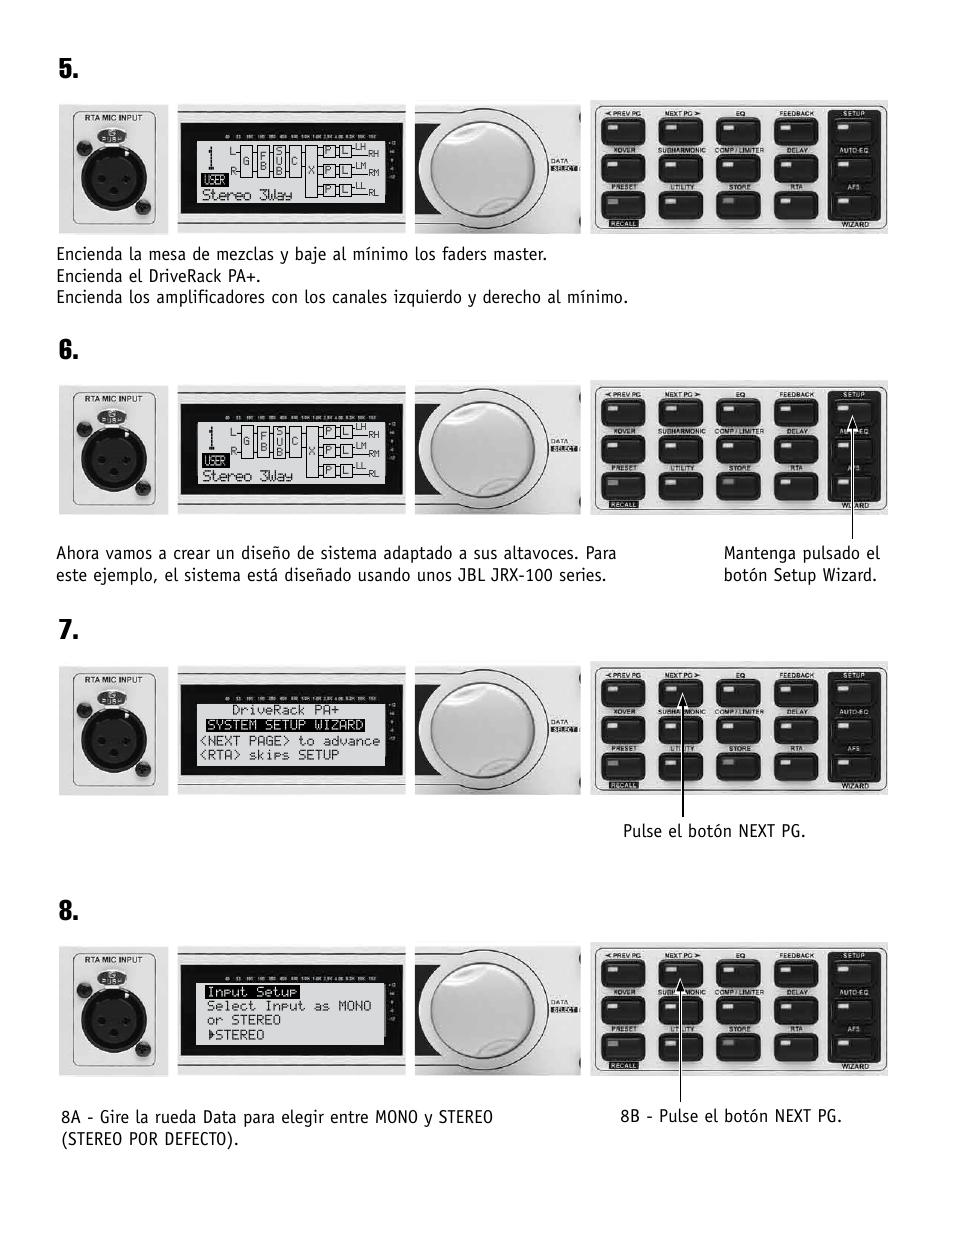 dbx DriveRack PA+ Quickstart Guide User Manual | Page 4 / 16